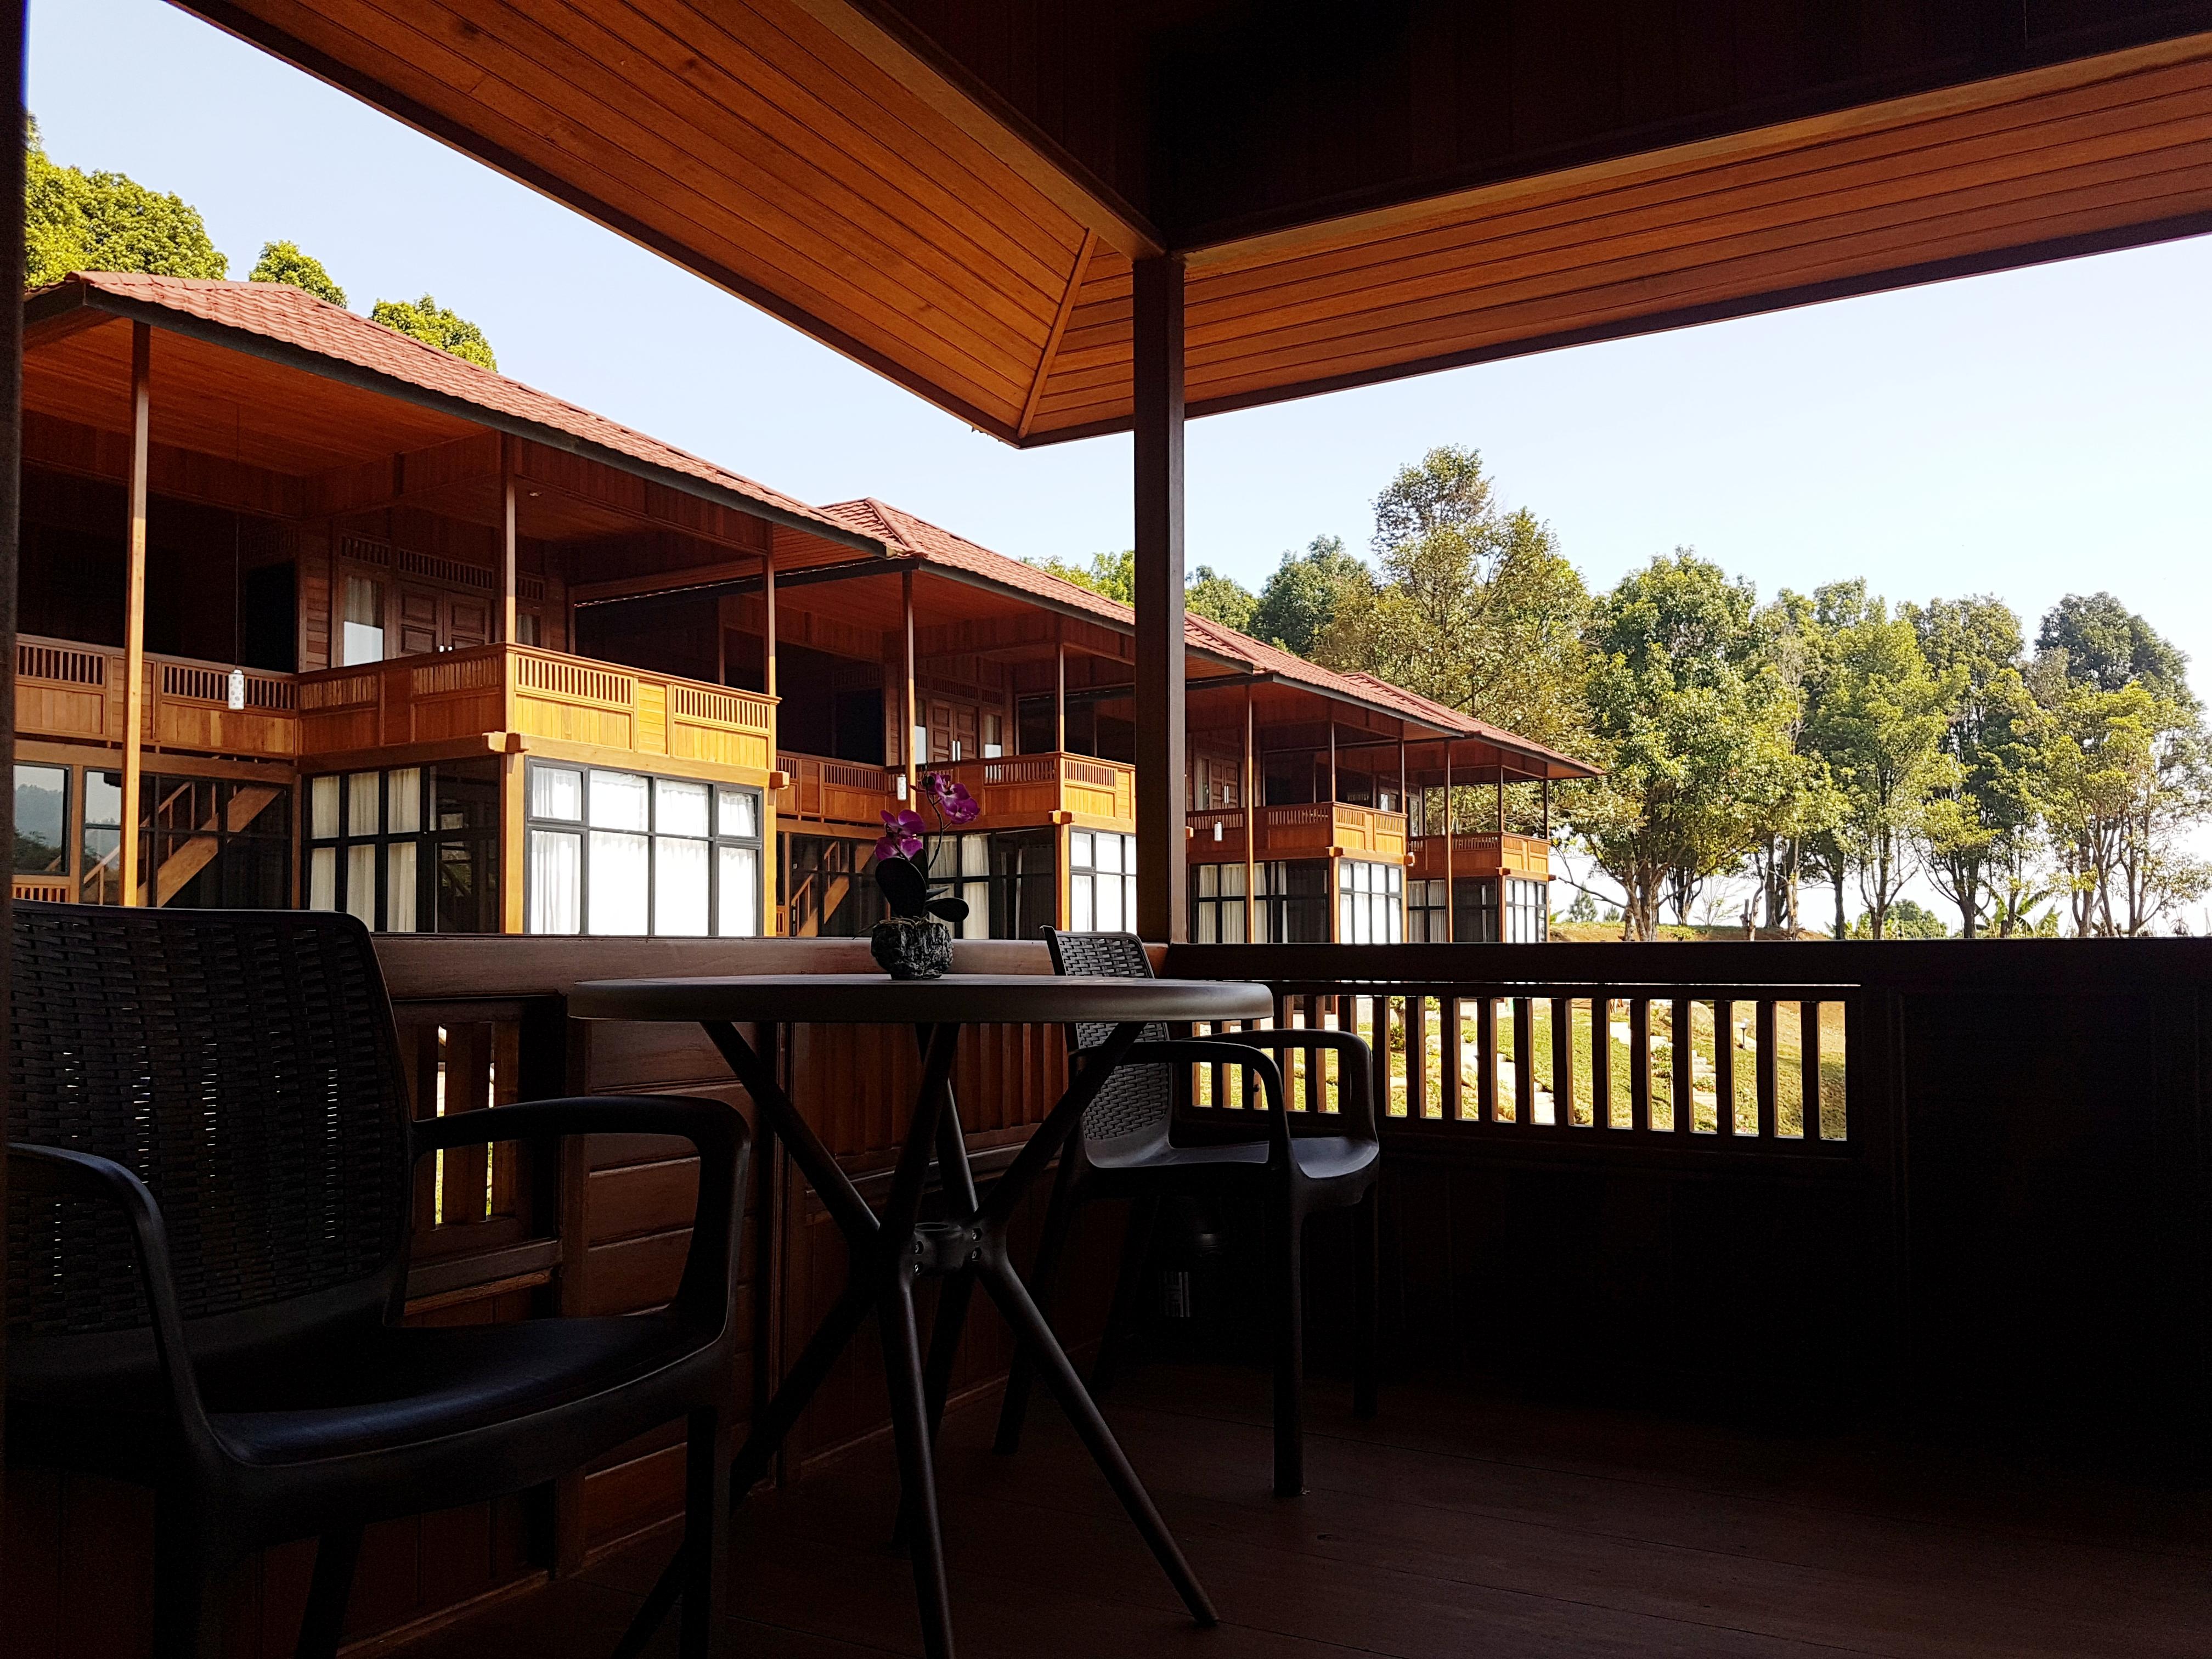 Ayo Ajak Keluarga dan Teman Outbond Seru di Gunung Geulis Camp Area! 2